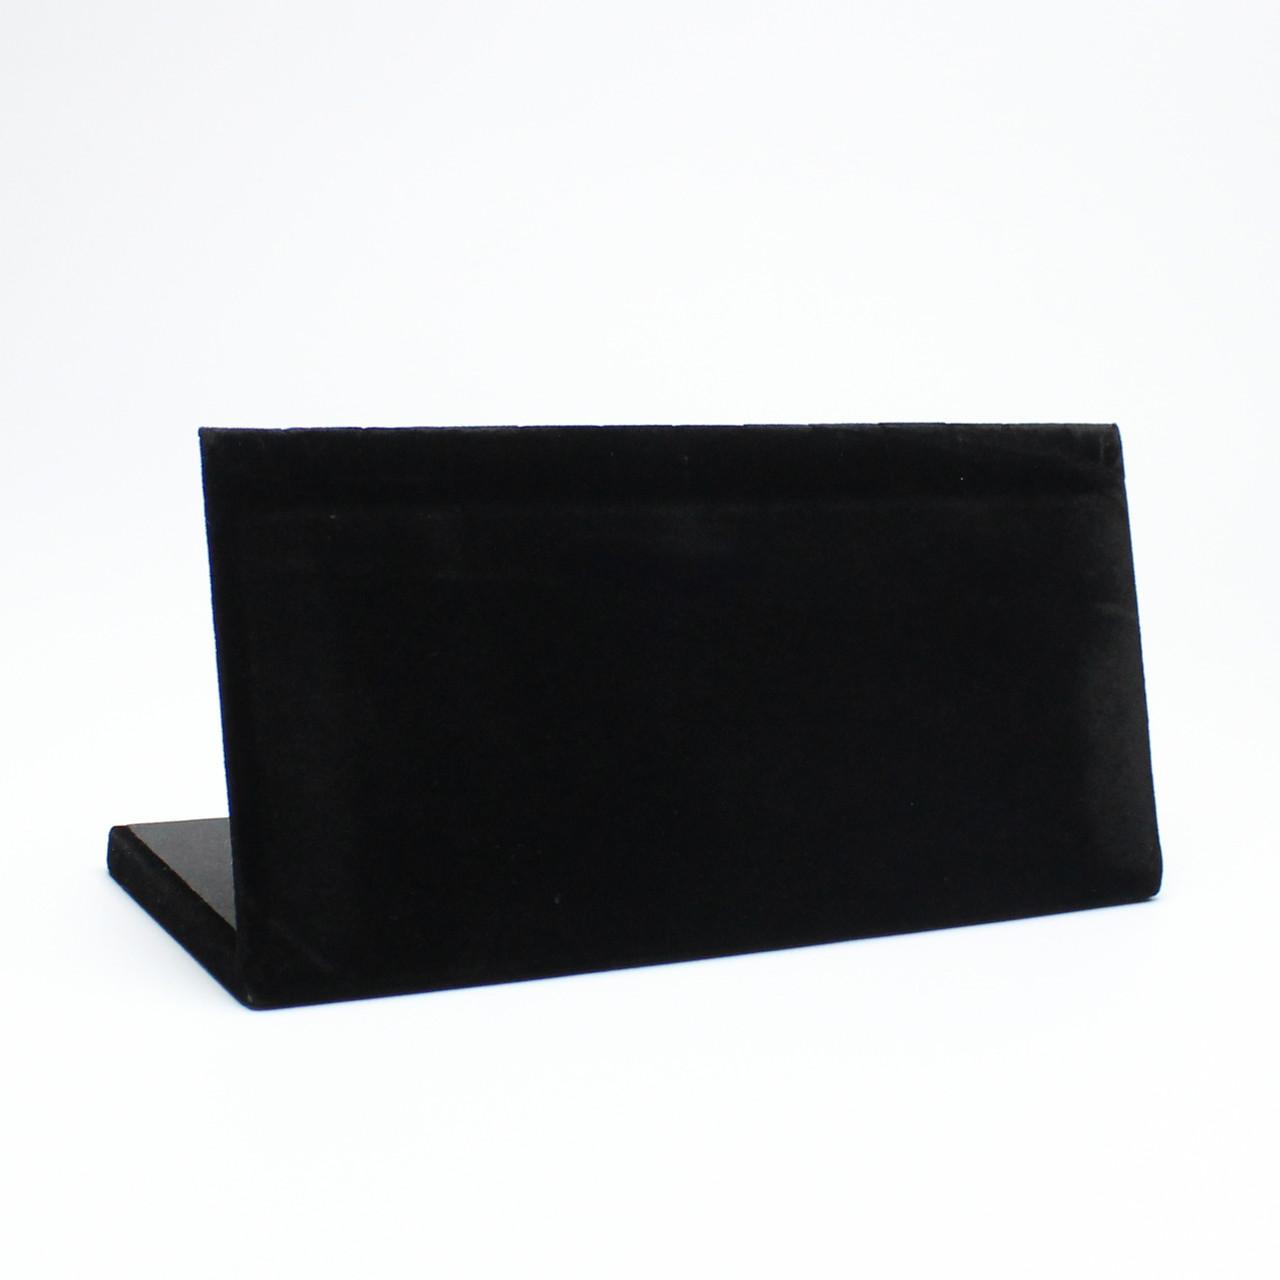 Подставка L для пирсинга черная